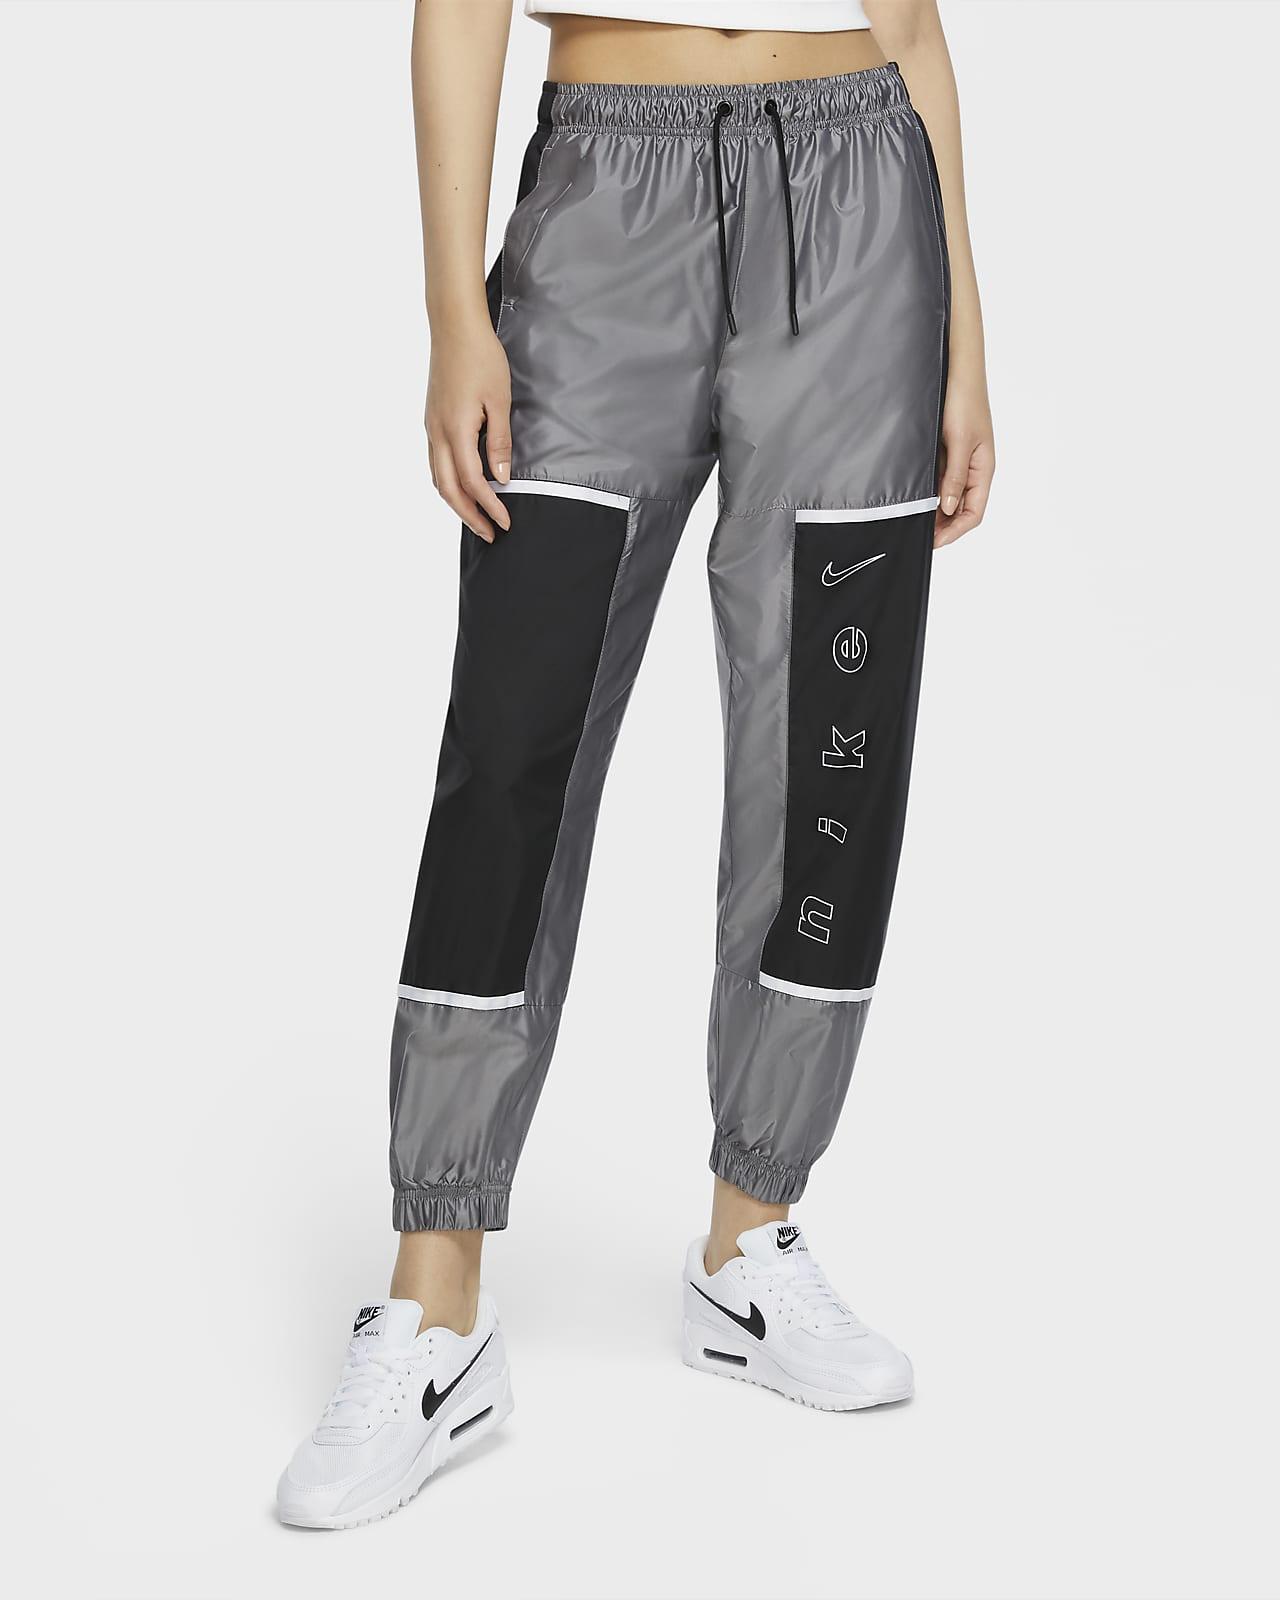 Женские брюки из тканого материала Nike Sportswear